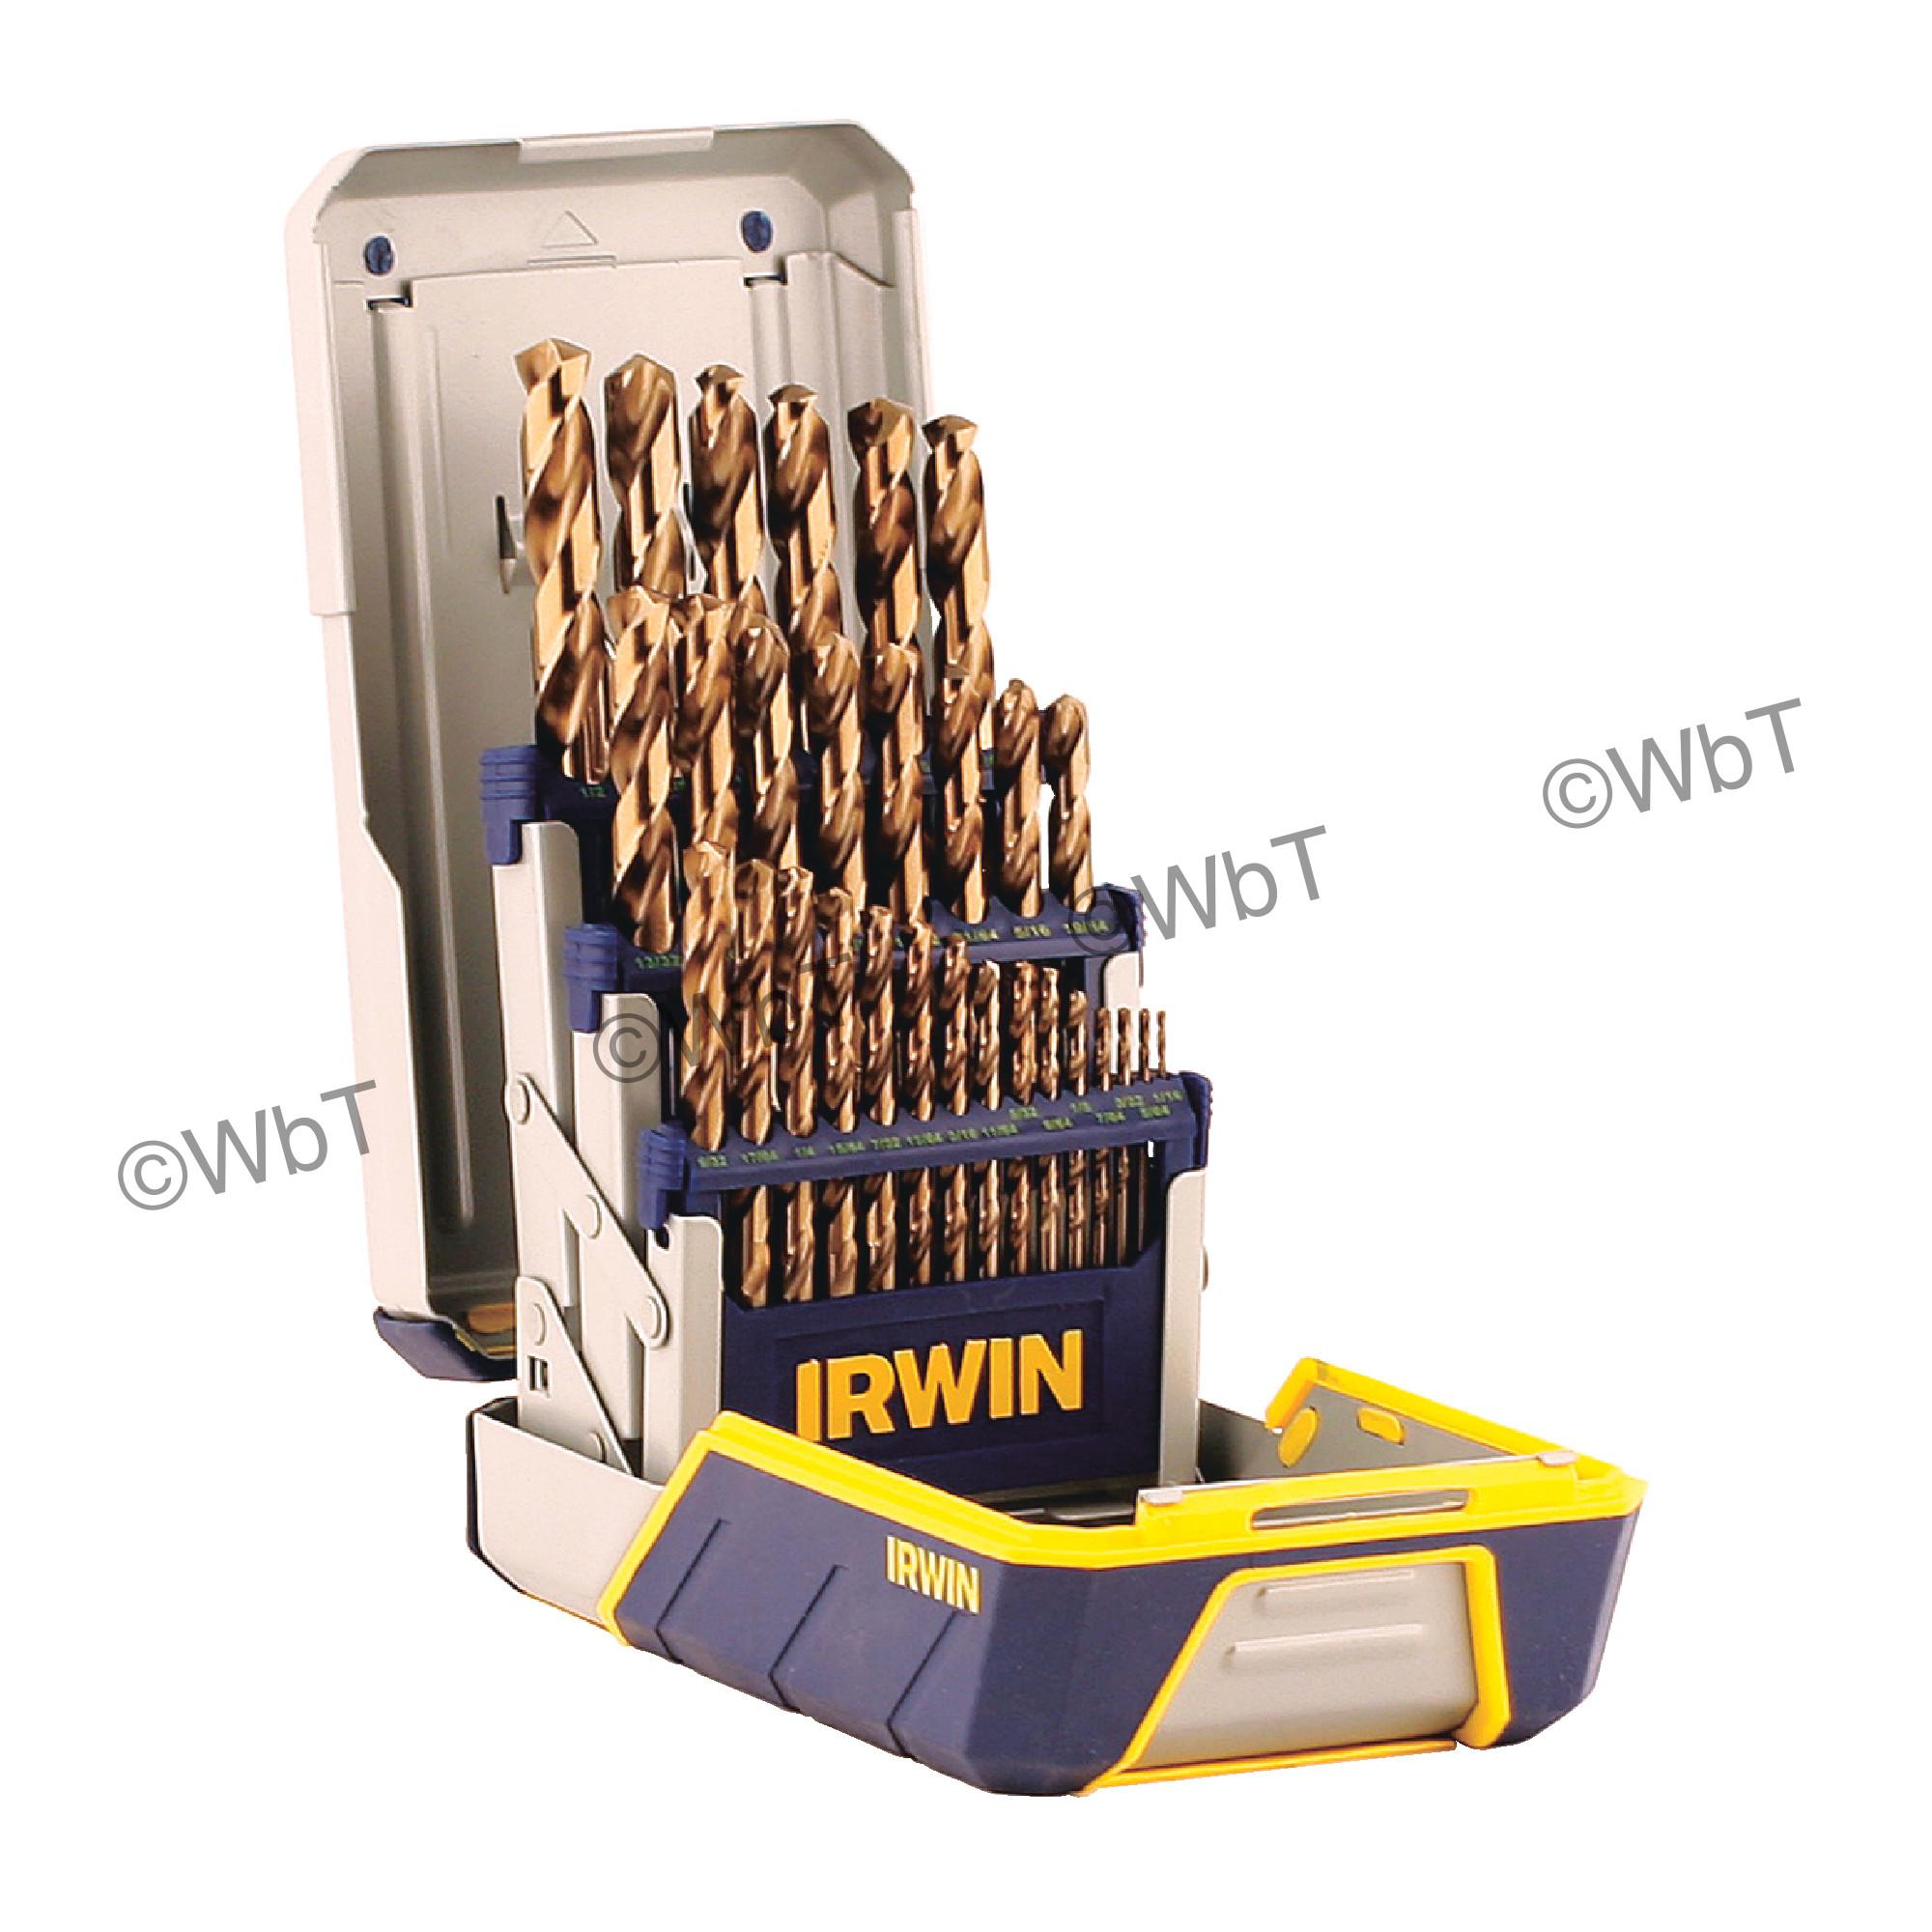 29 Piece Fractional Jobber Length Drill Sets